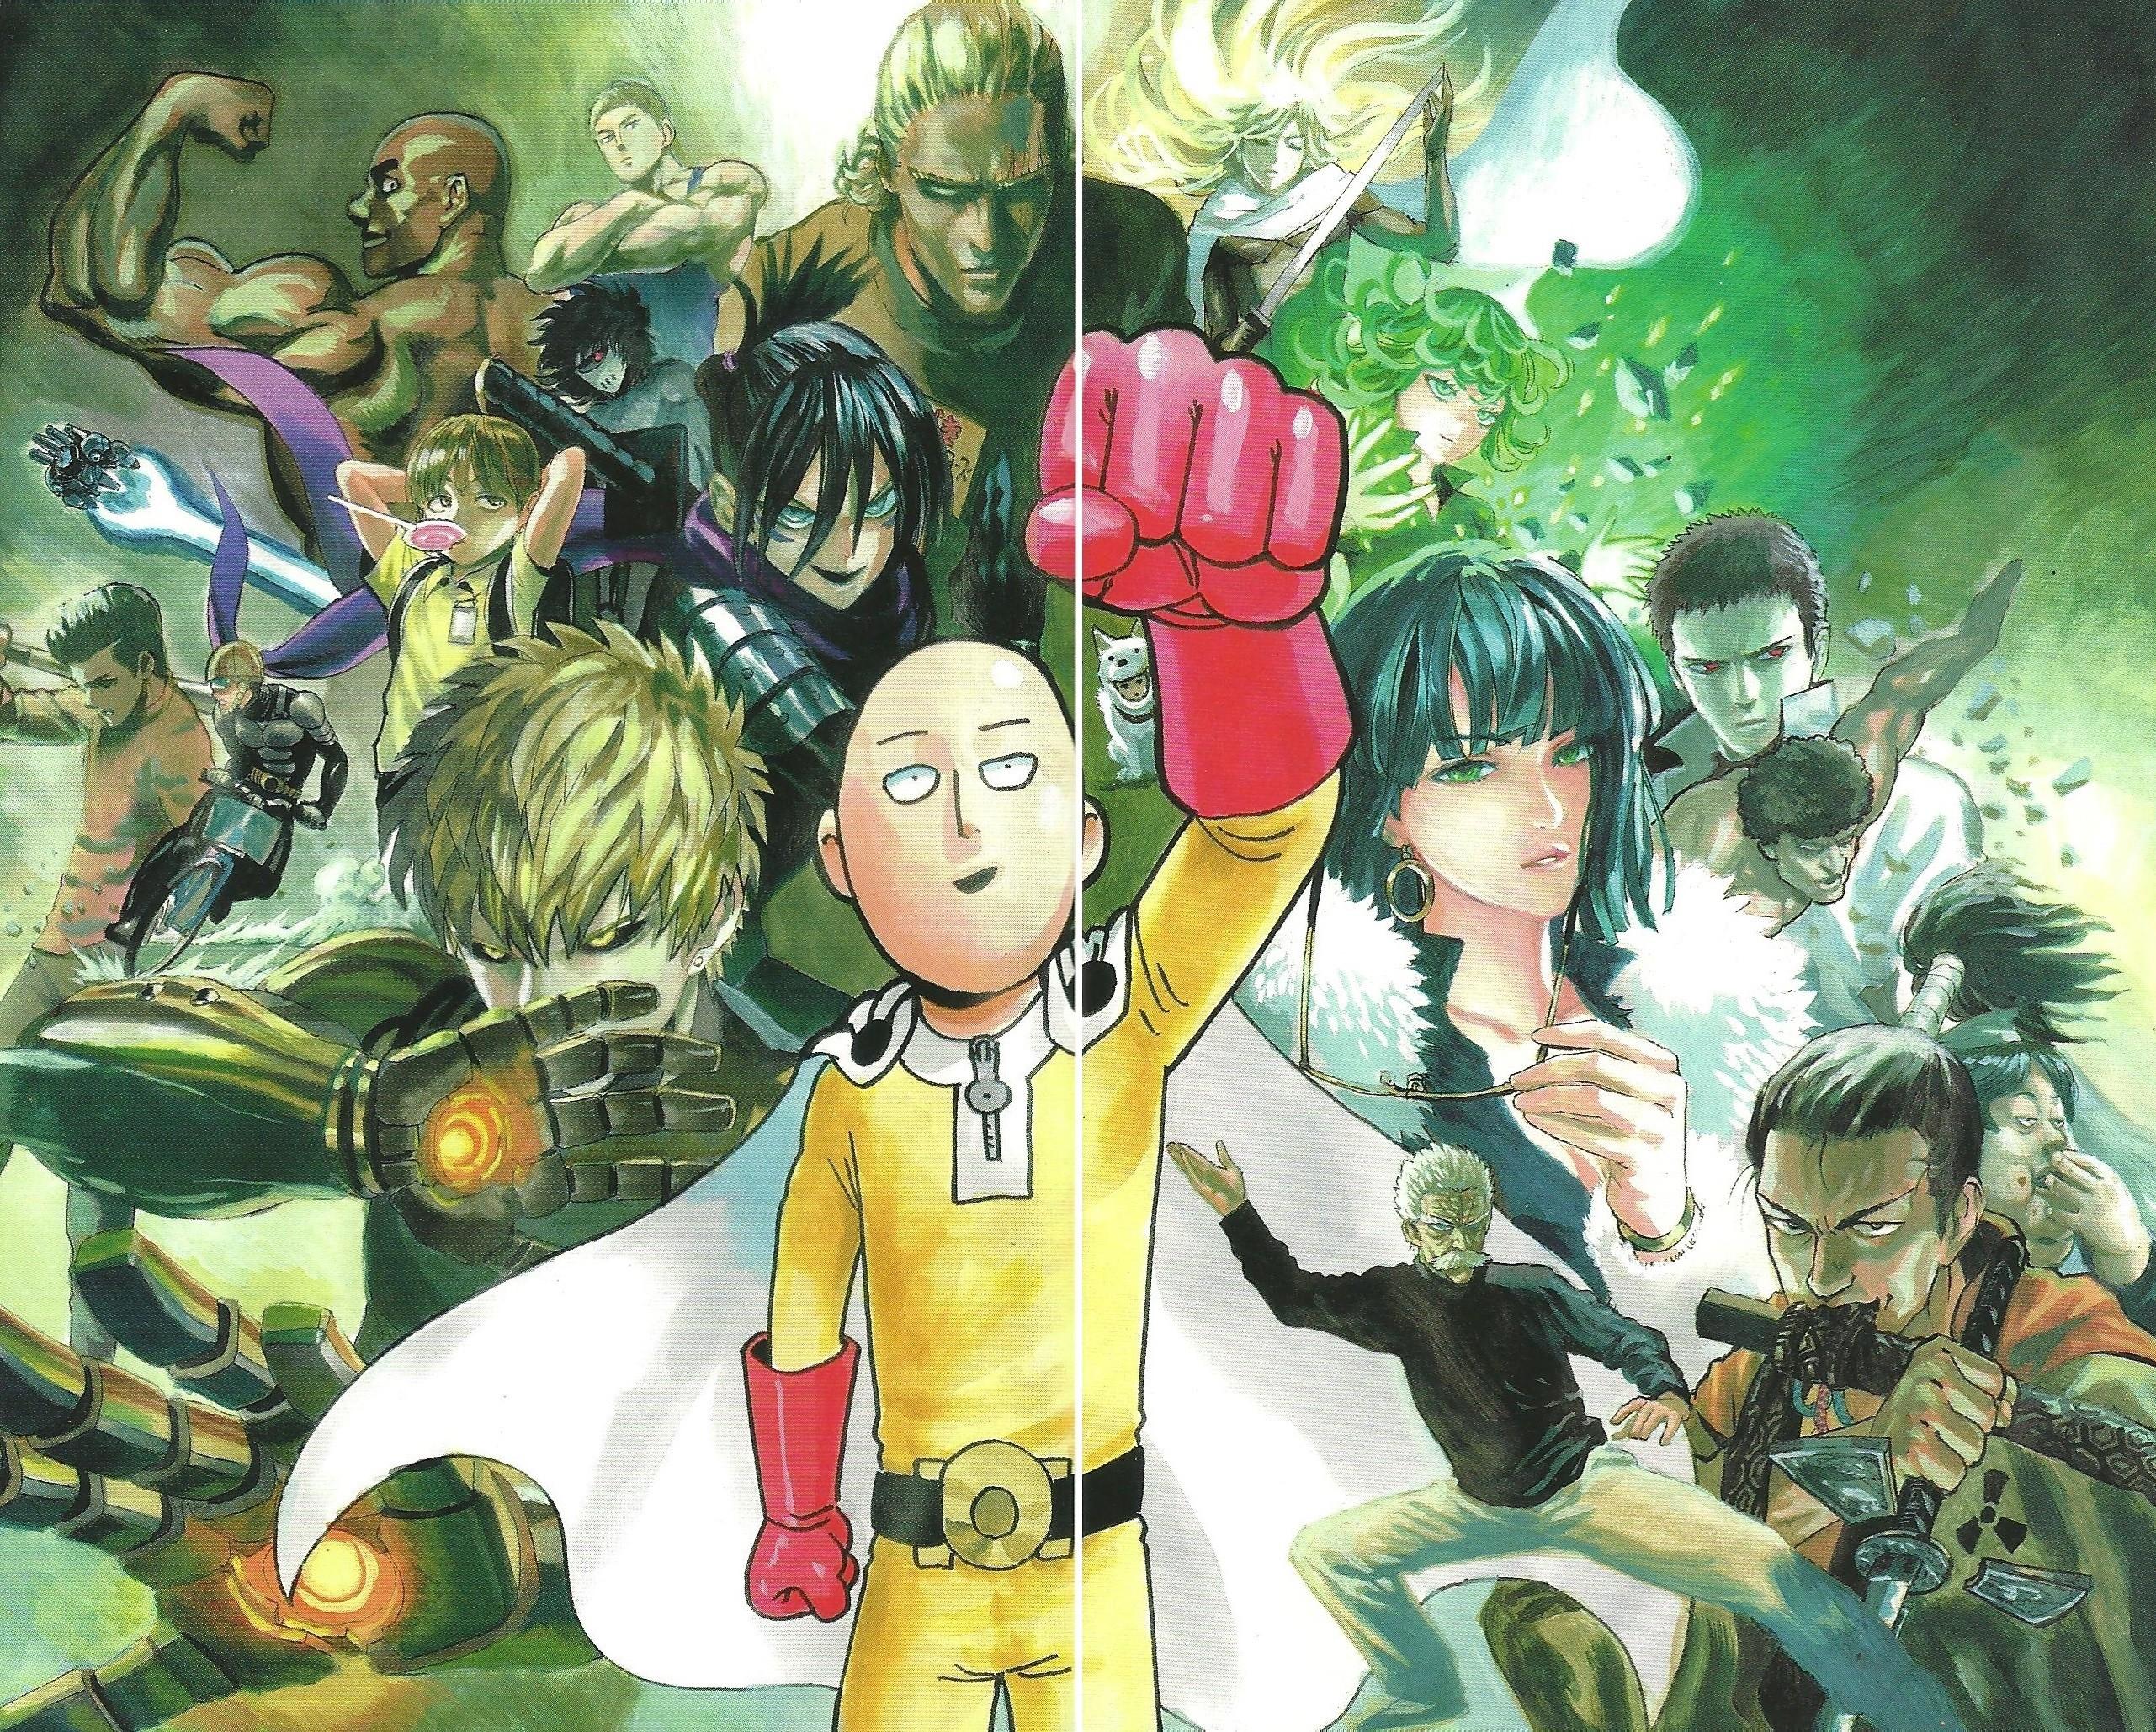 Saitama Images Of One Punch Man - One Punch Man Saitama Wallpapers (76+ images)